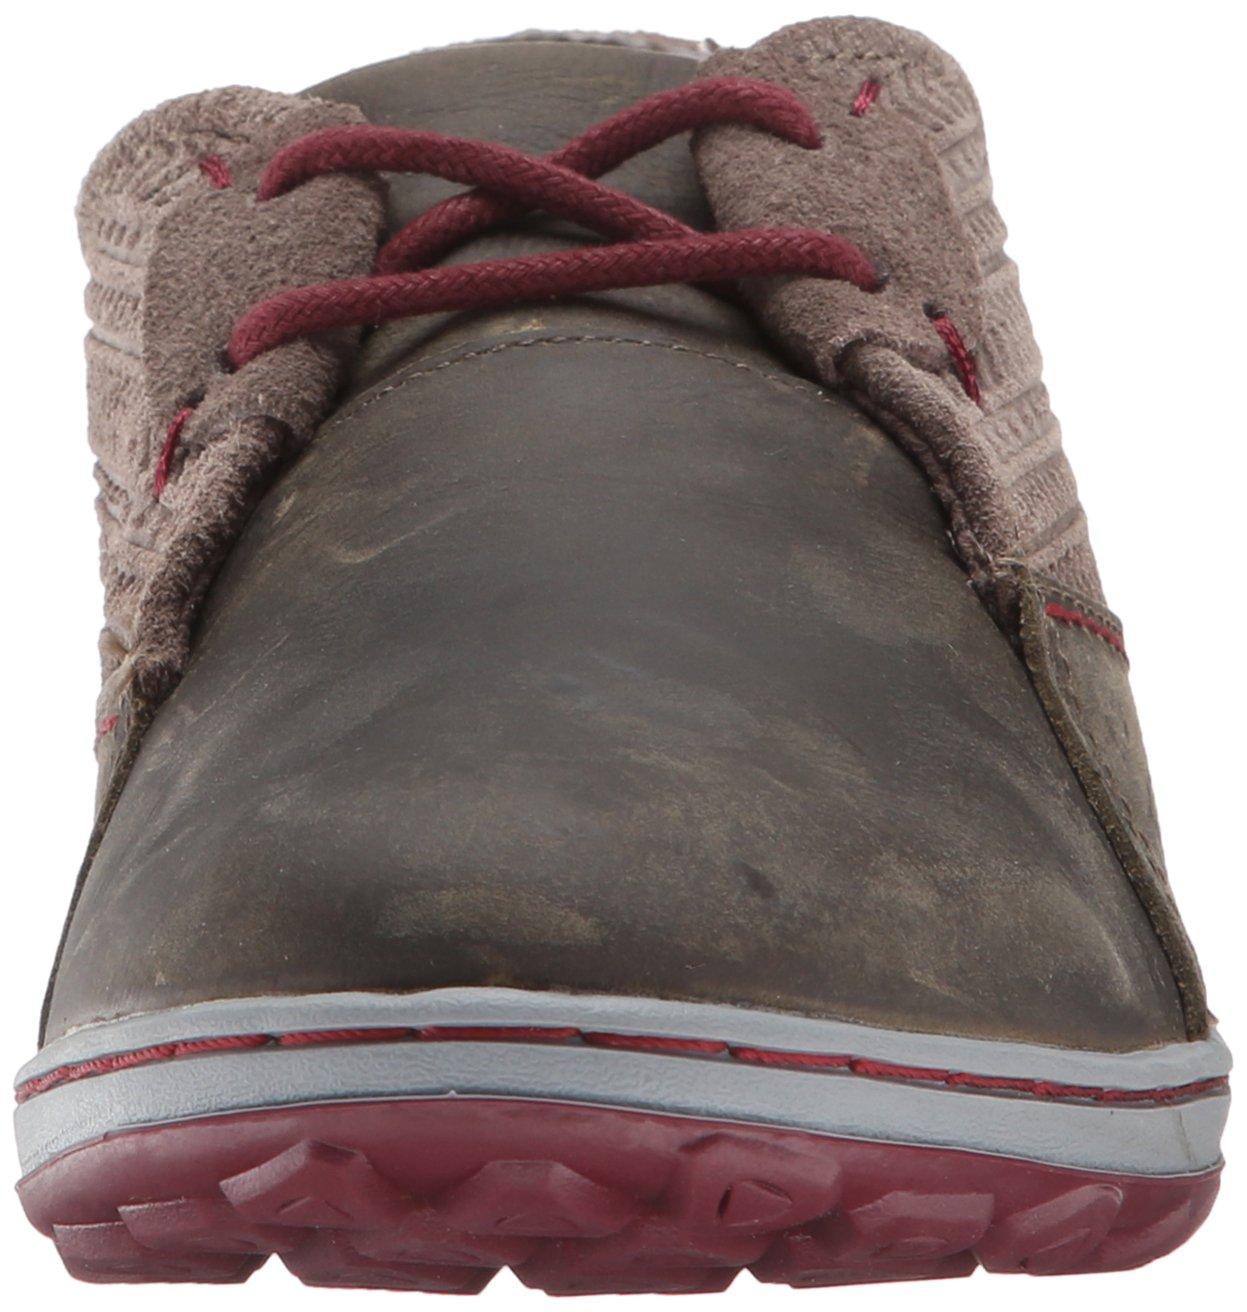 Merrell Women's Ashland Tie Shoe B00RDQLNIC 9 B(M) US|Bungee Cord